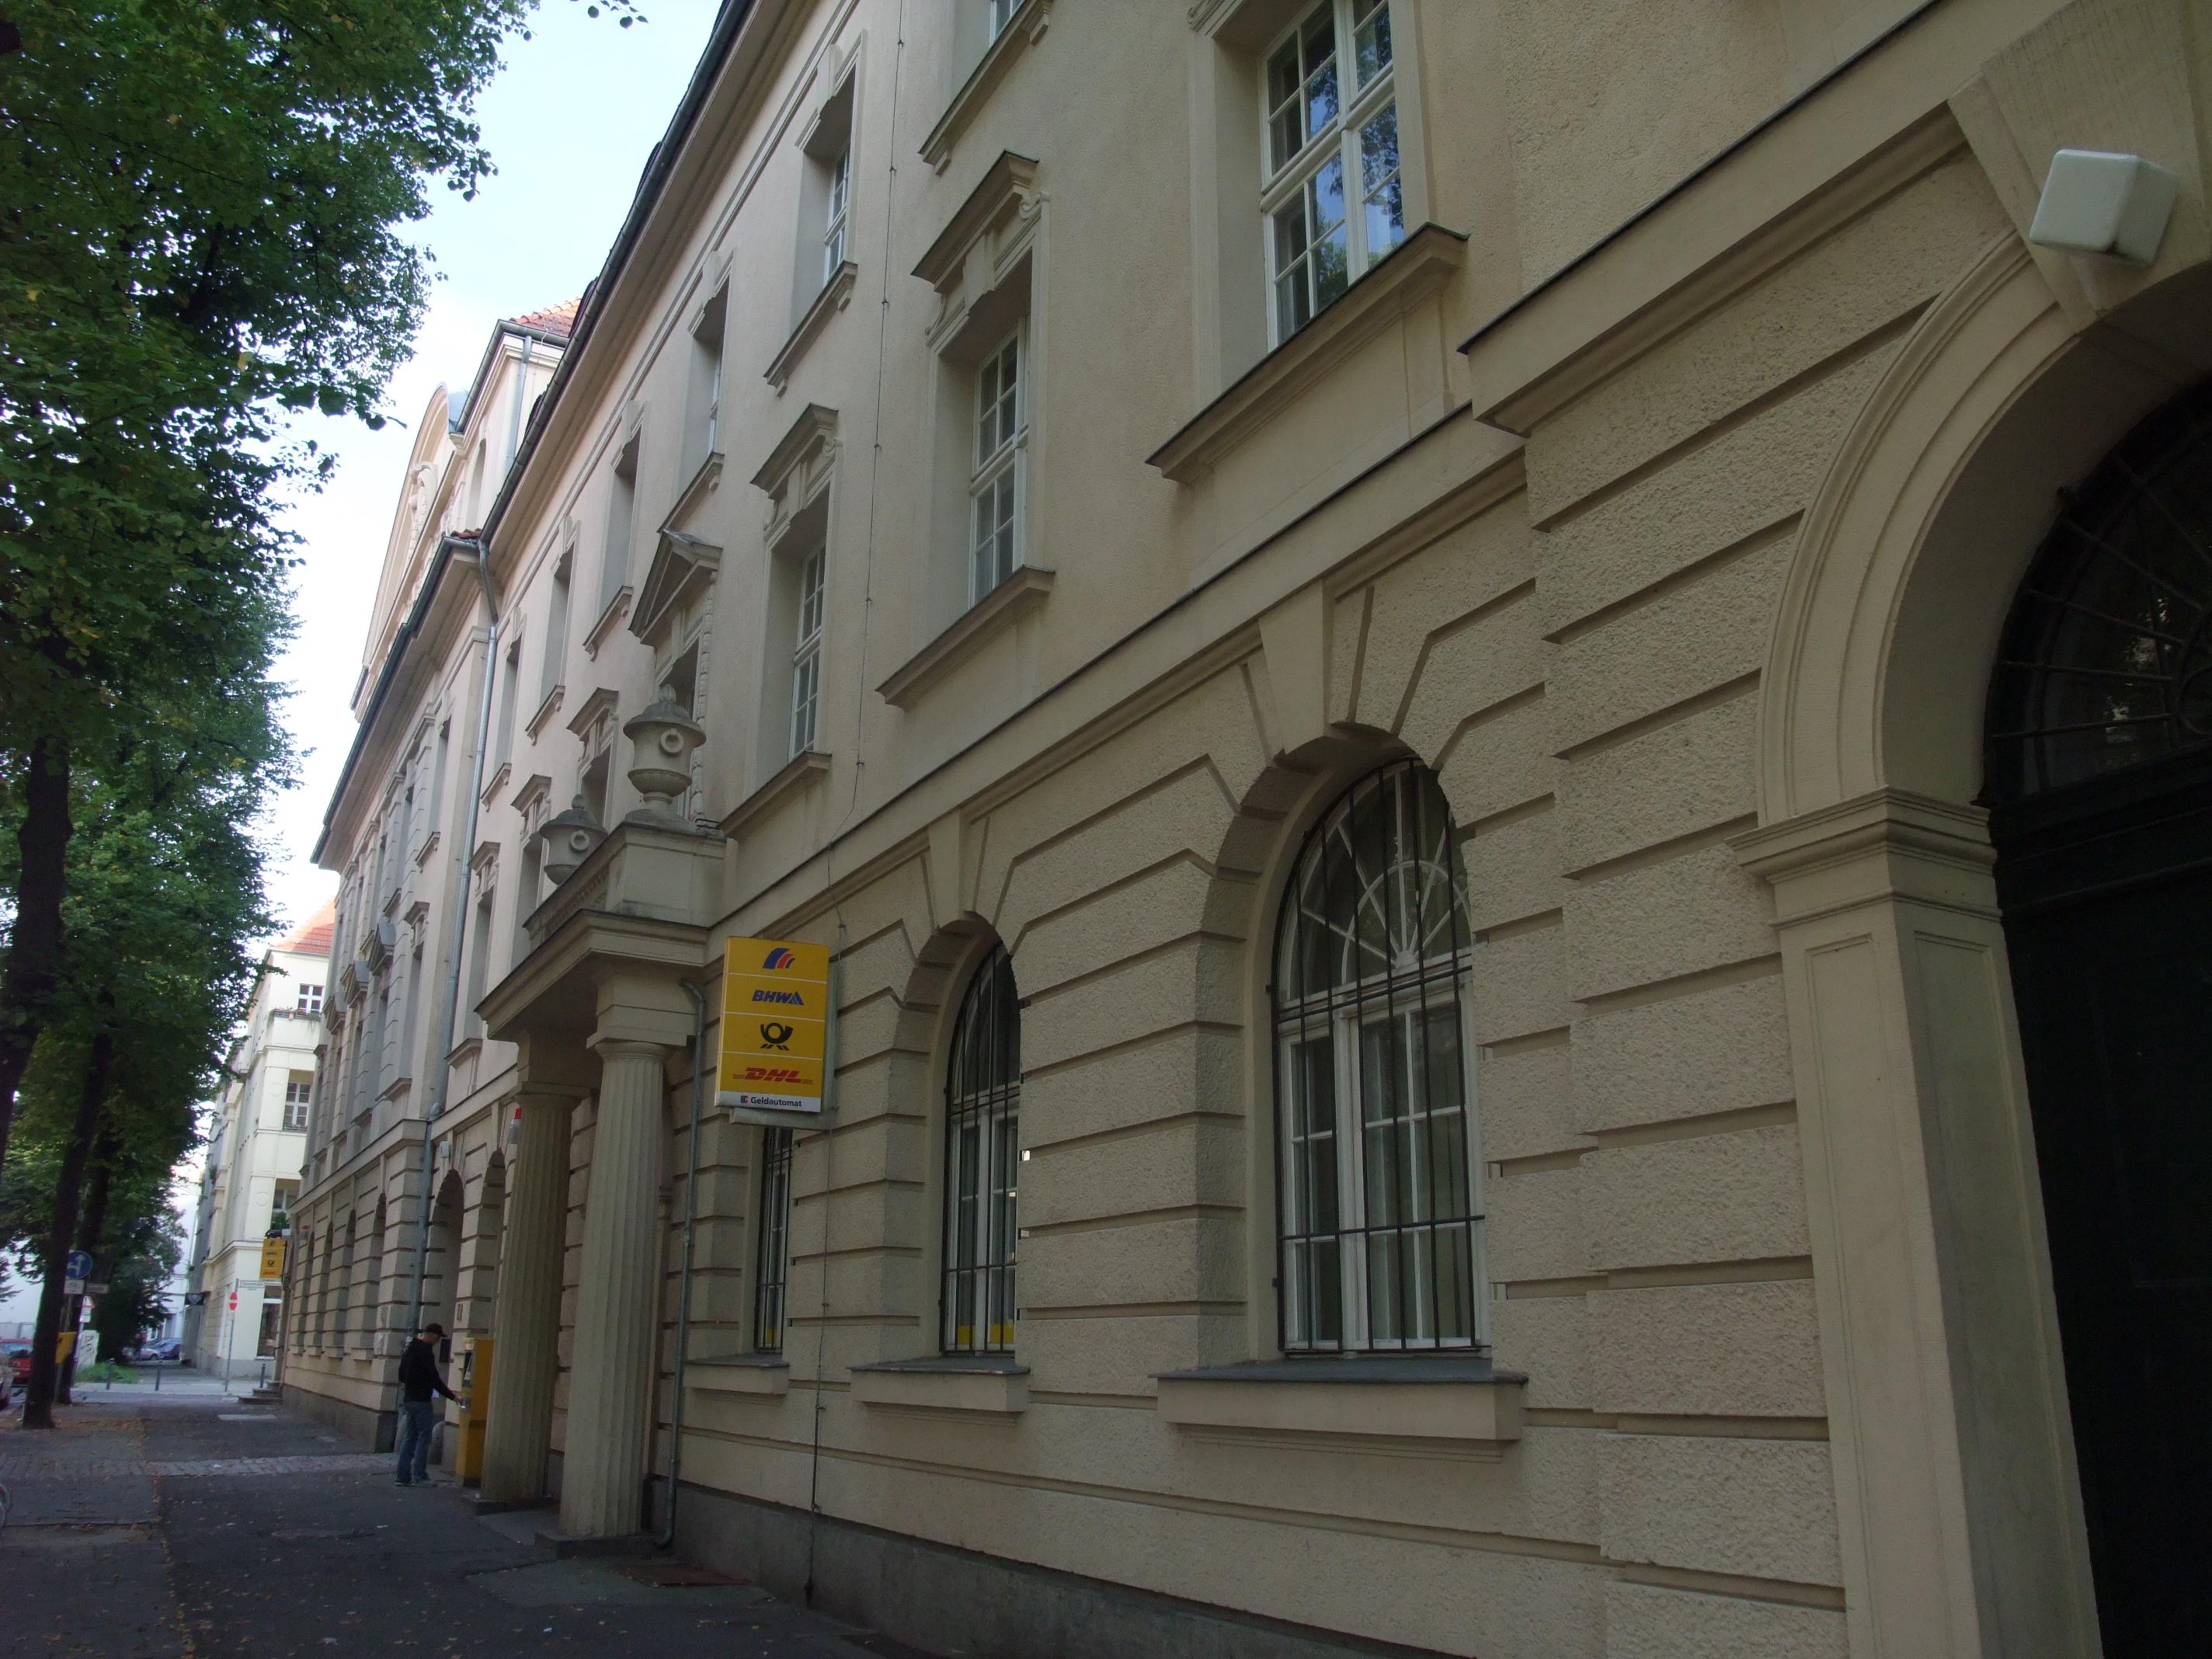 file 20110904 023 berlin weissensee charlottenburger strasse postamt jpg wikimedia commons. Black Bedroom Furniture Sets. Home Design Ideas